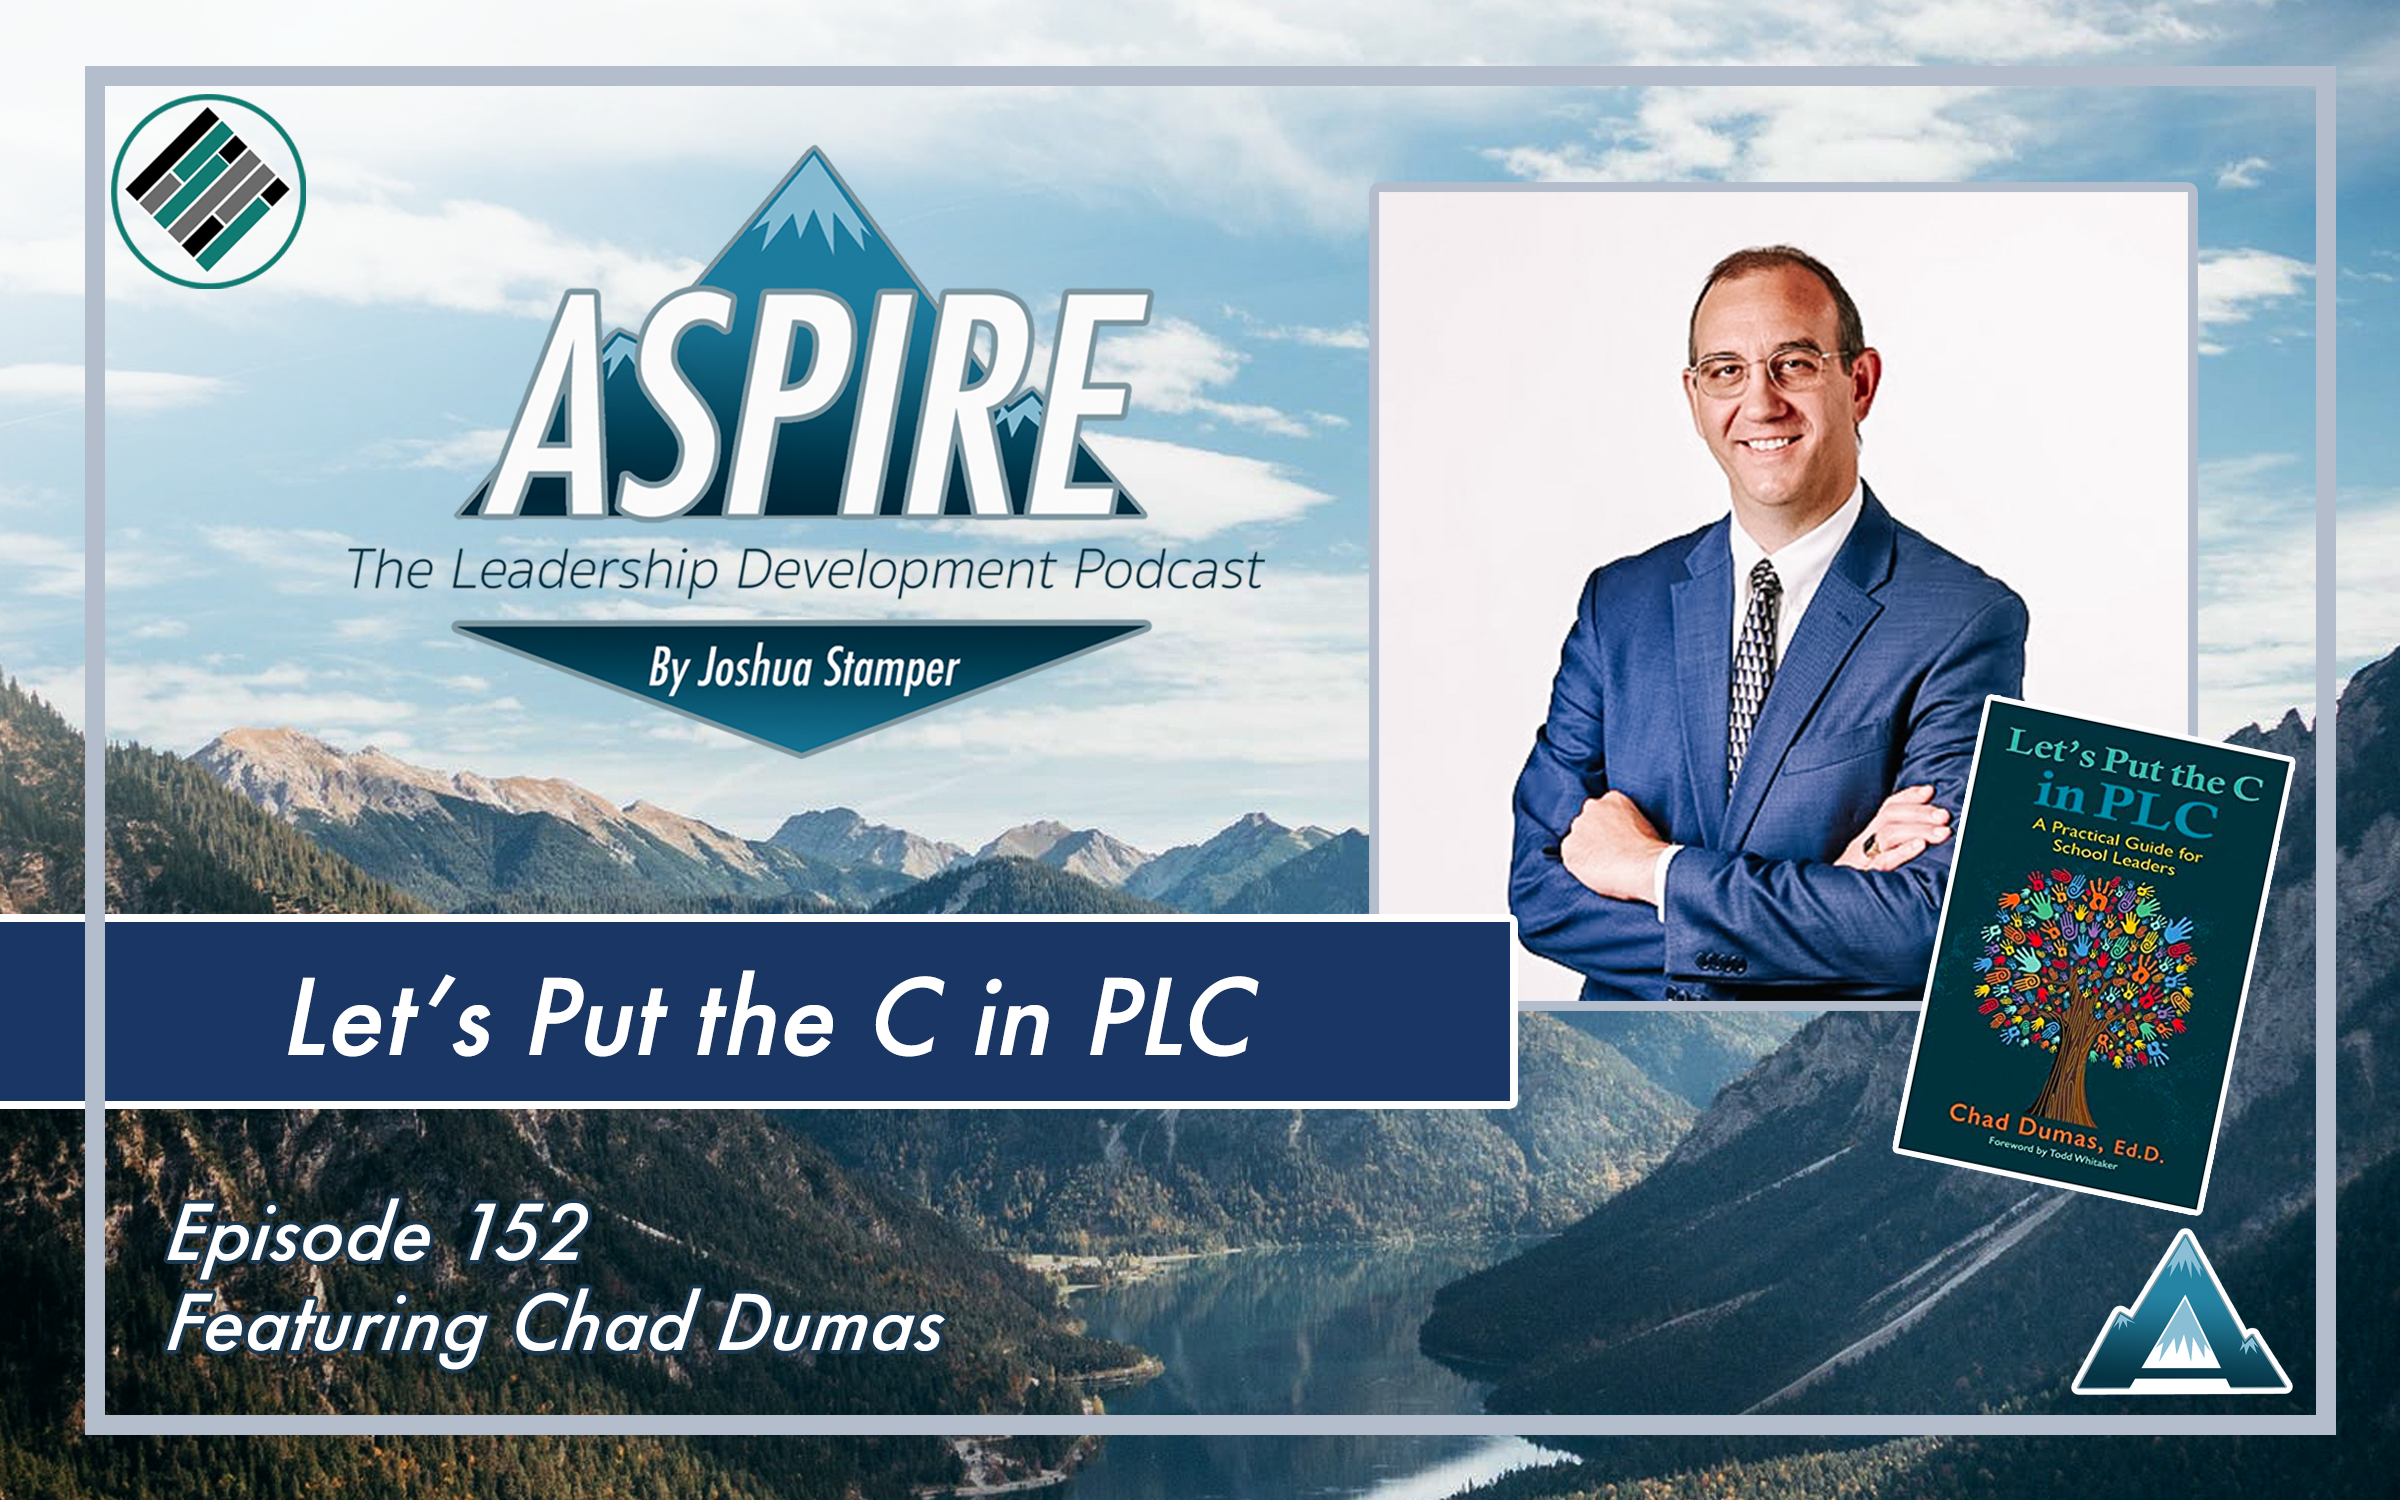 Joshua Stamper, Chad Dumas, Aspire: The Leadership Development Podcast, Teach better, Let's Put the C in PLC